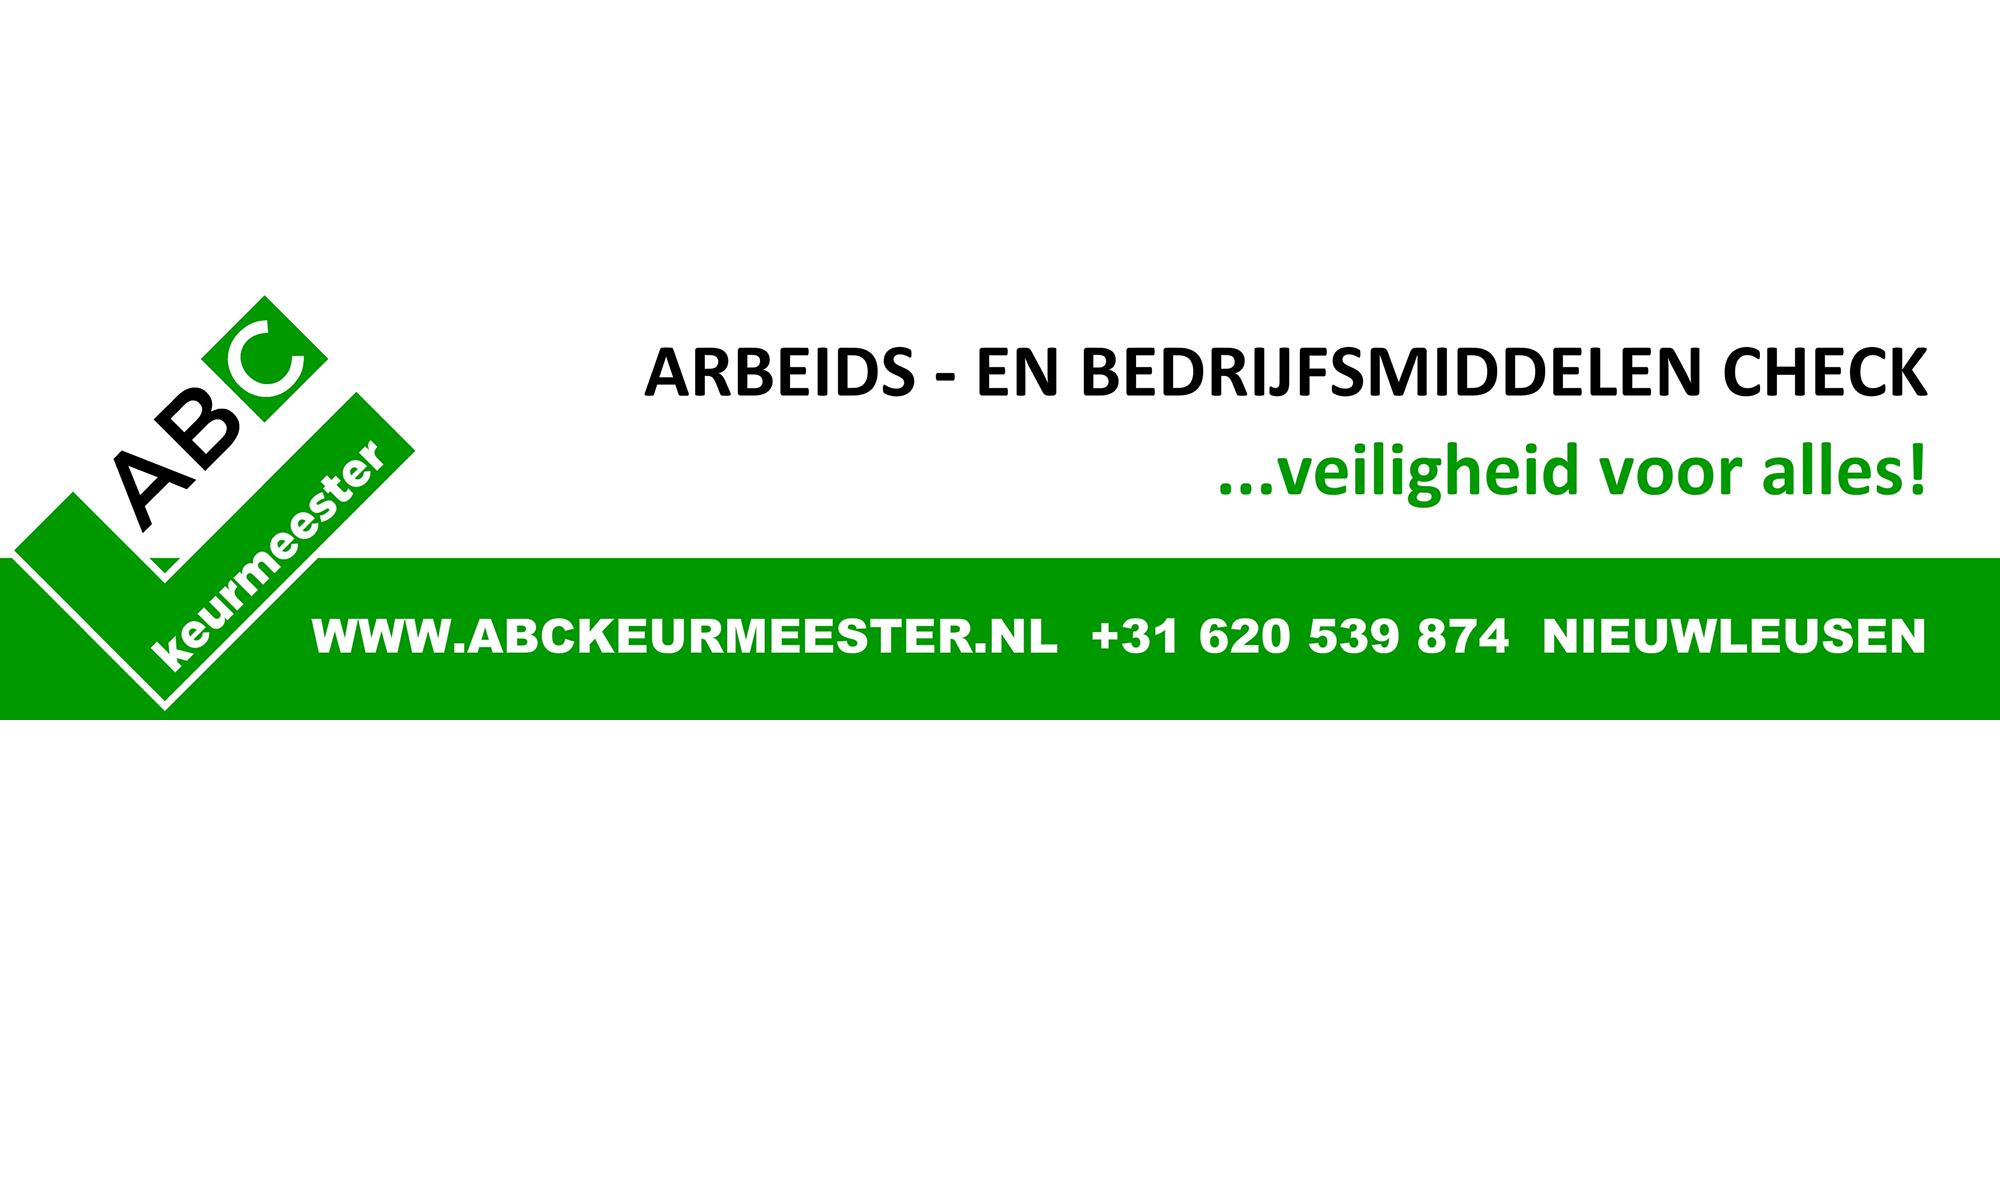 abckeurmeester.nl